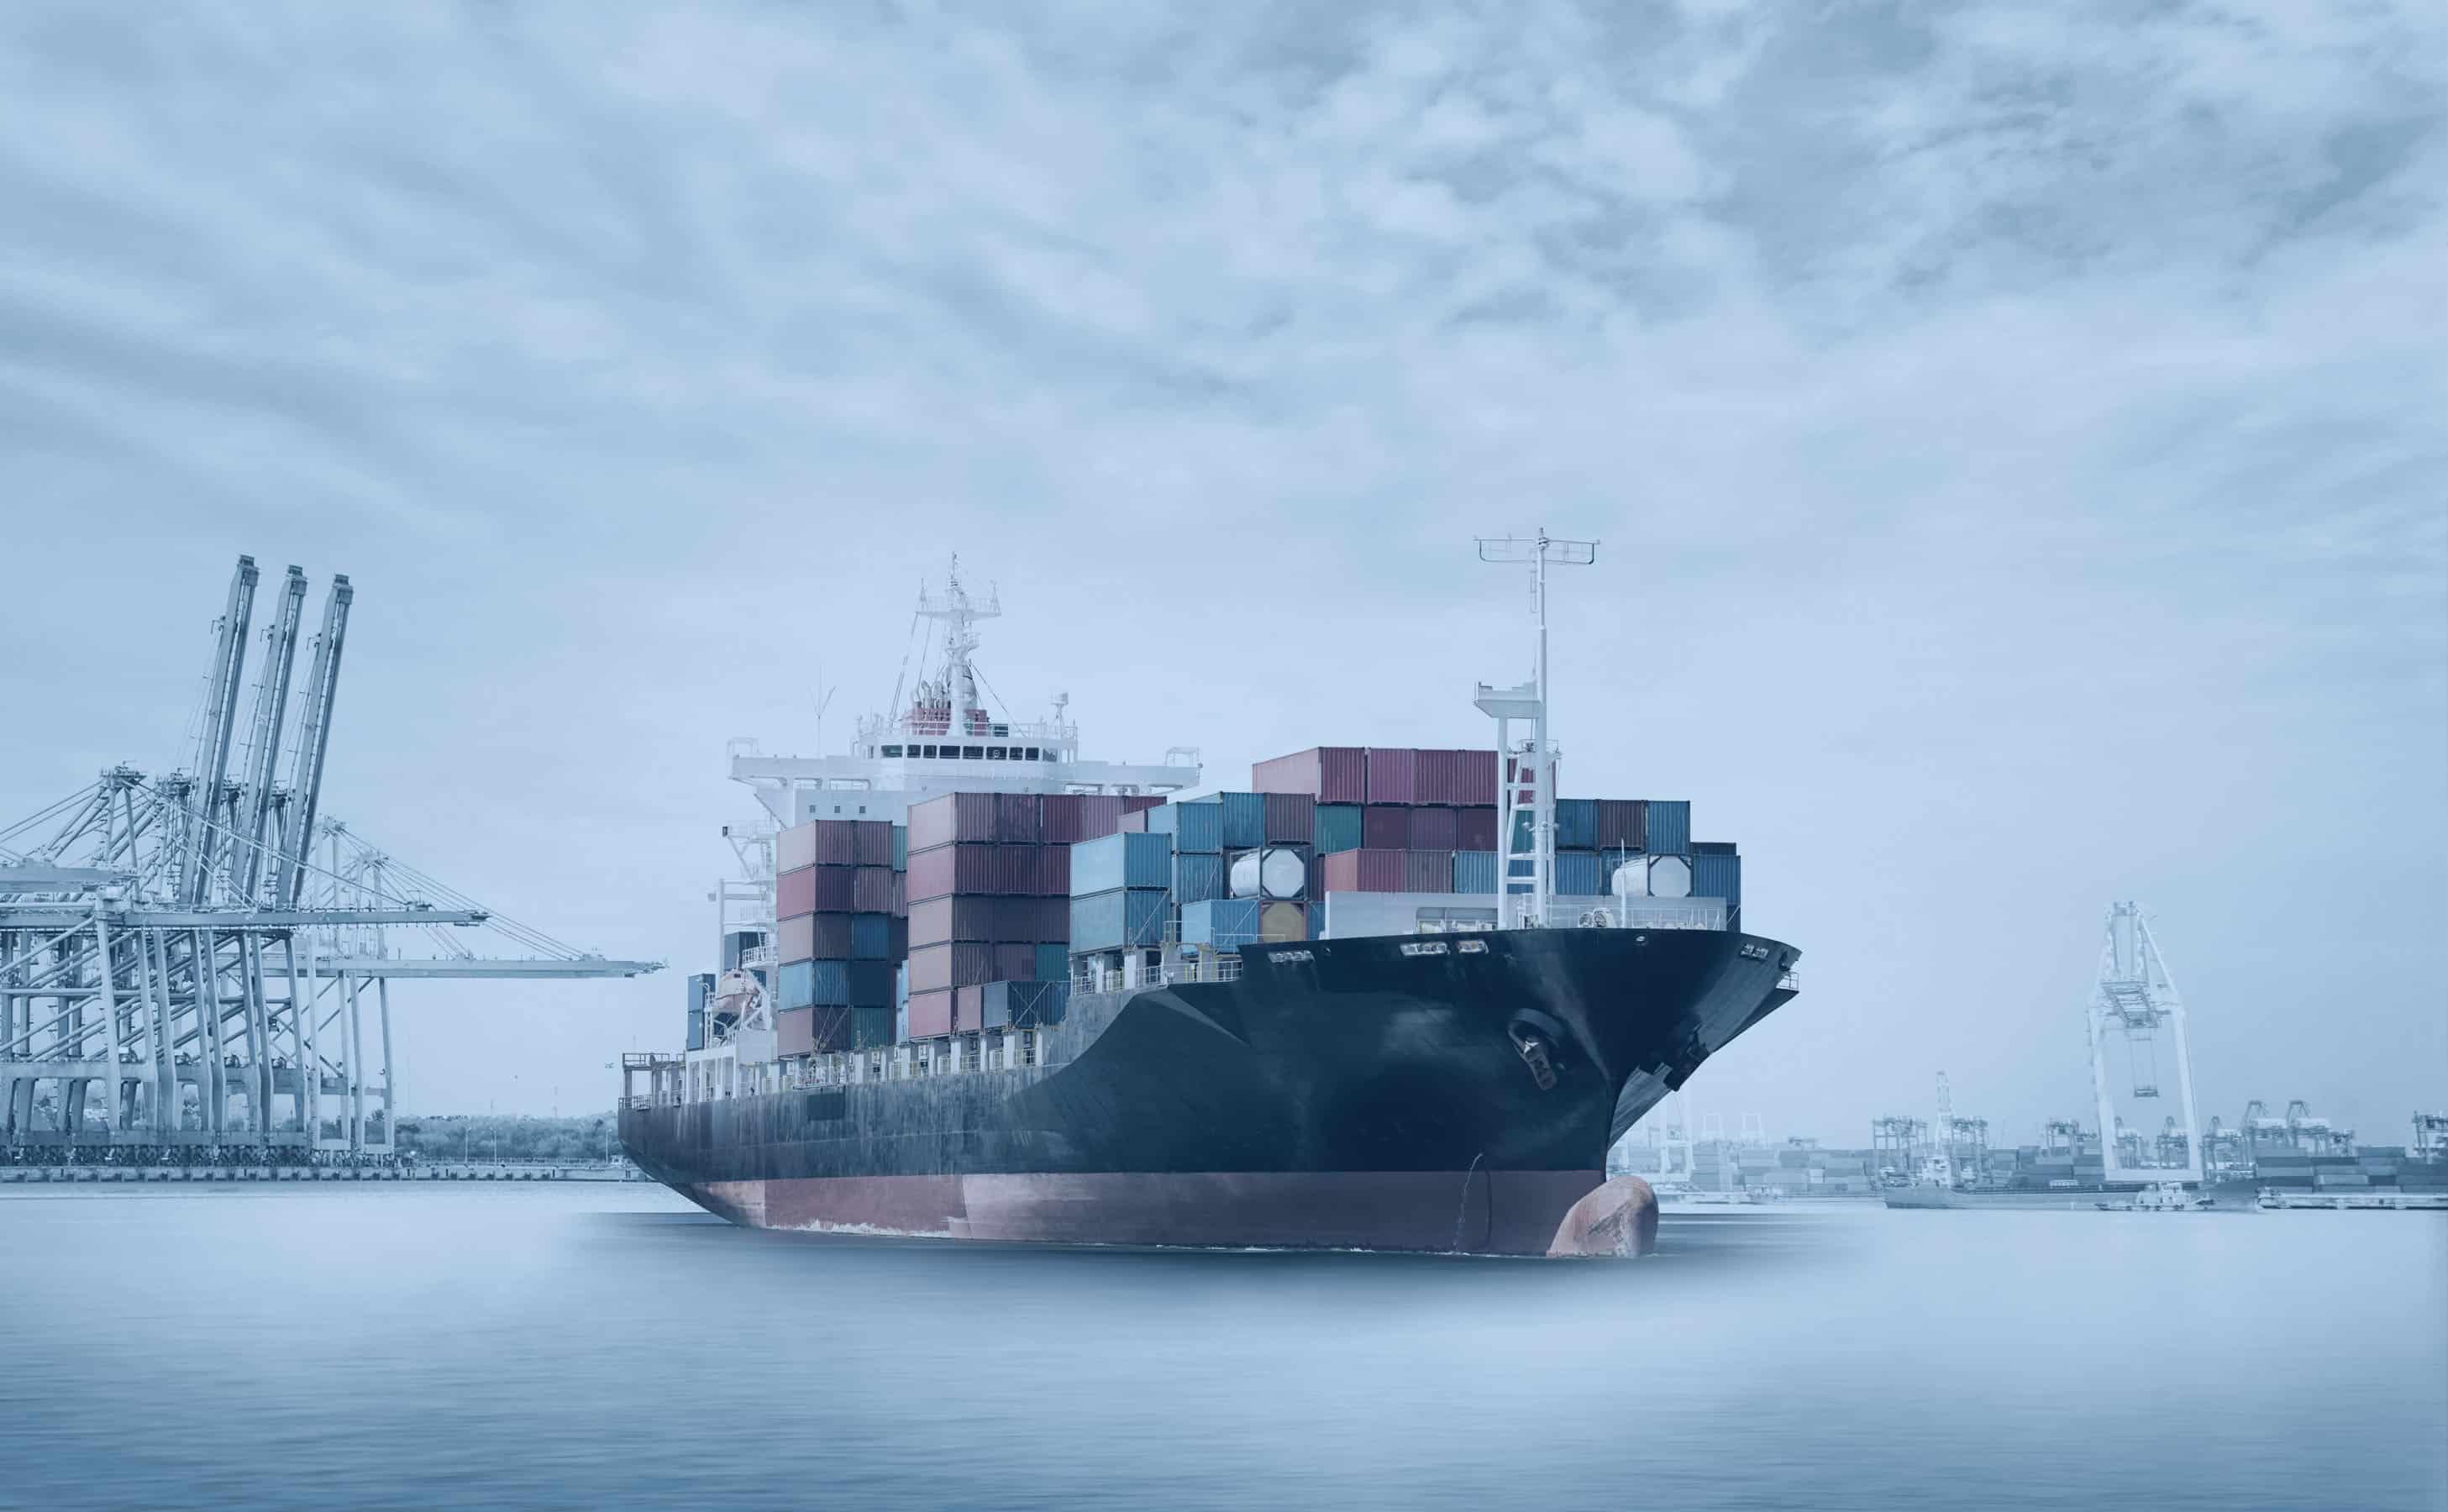 A shipment